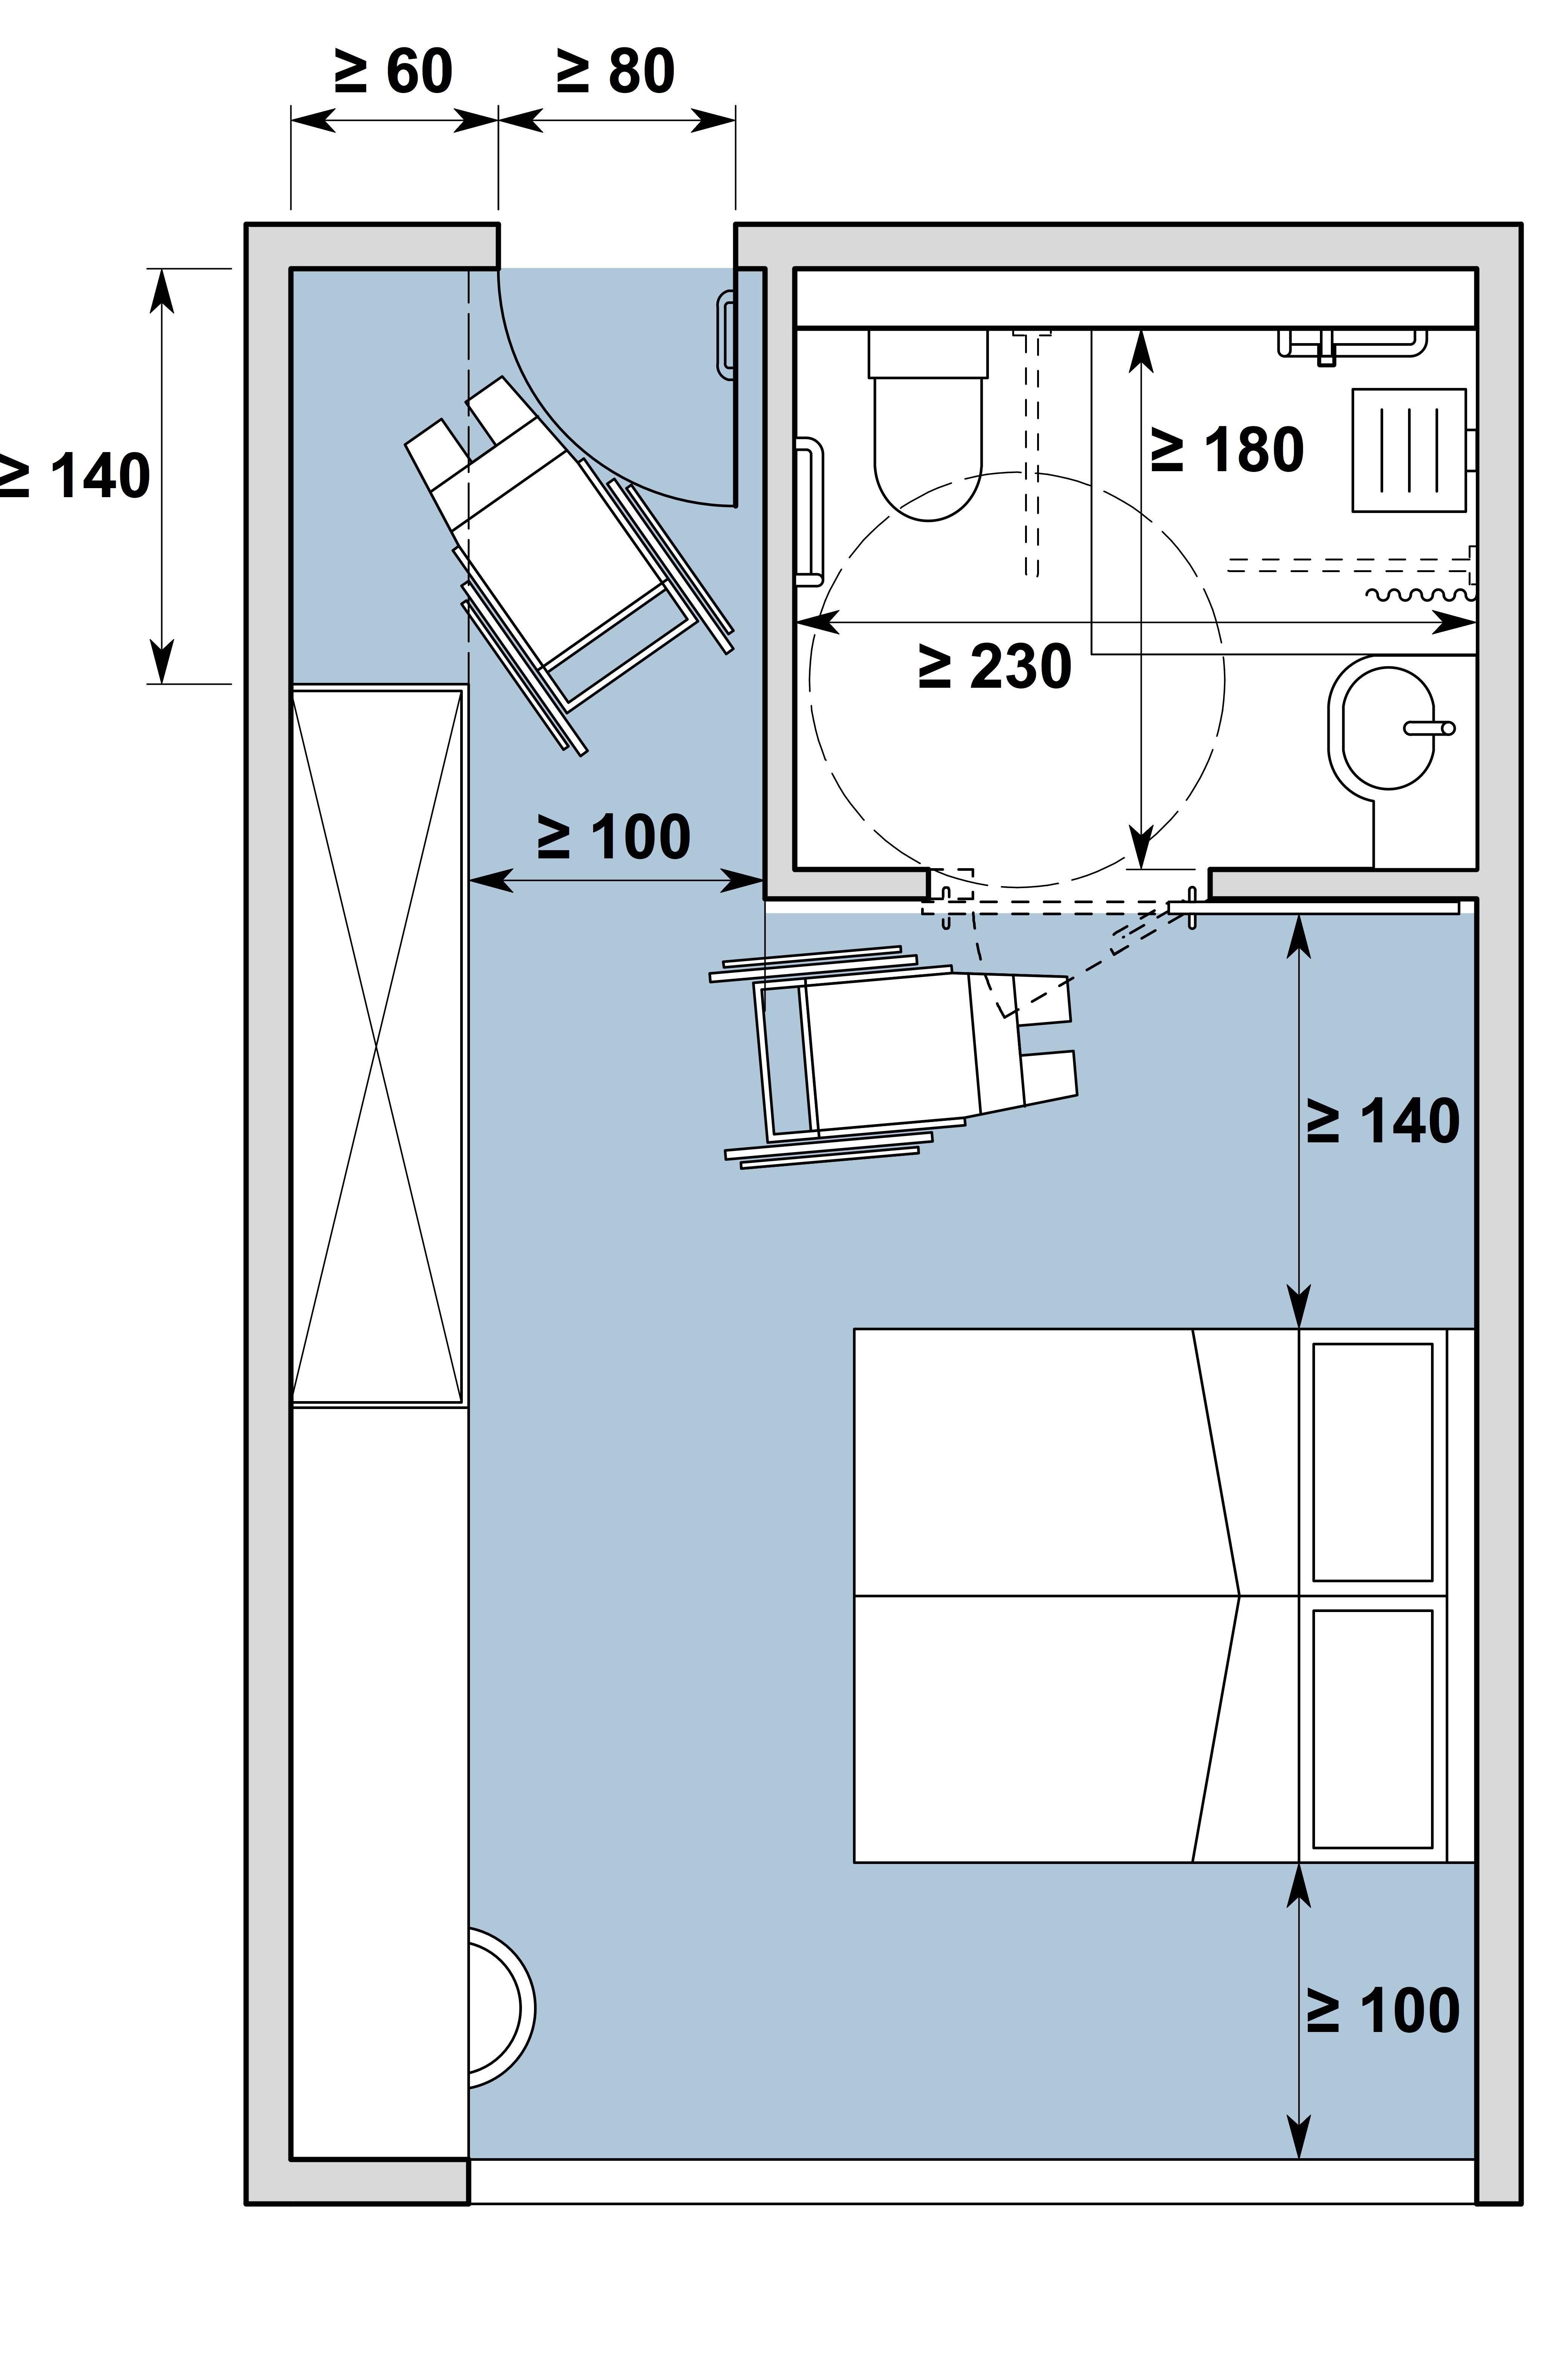 Chambre d'hôtes / Gästezimmer Typ I, variante b